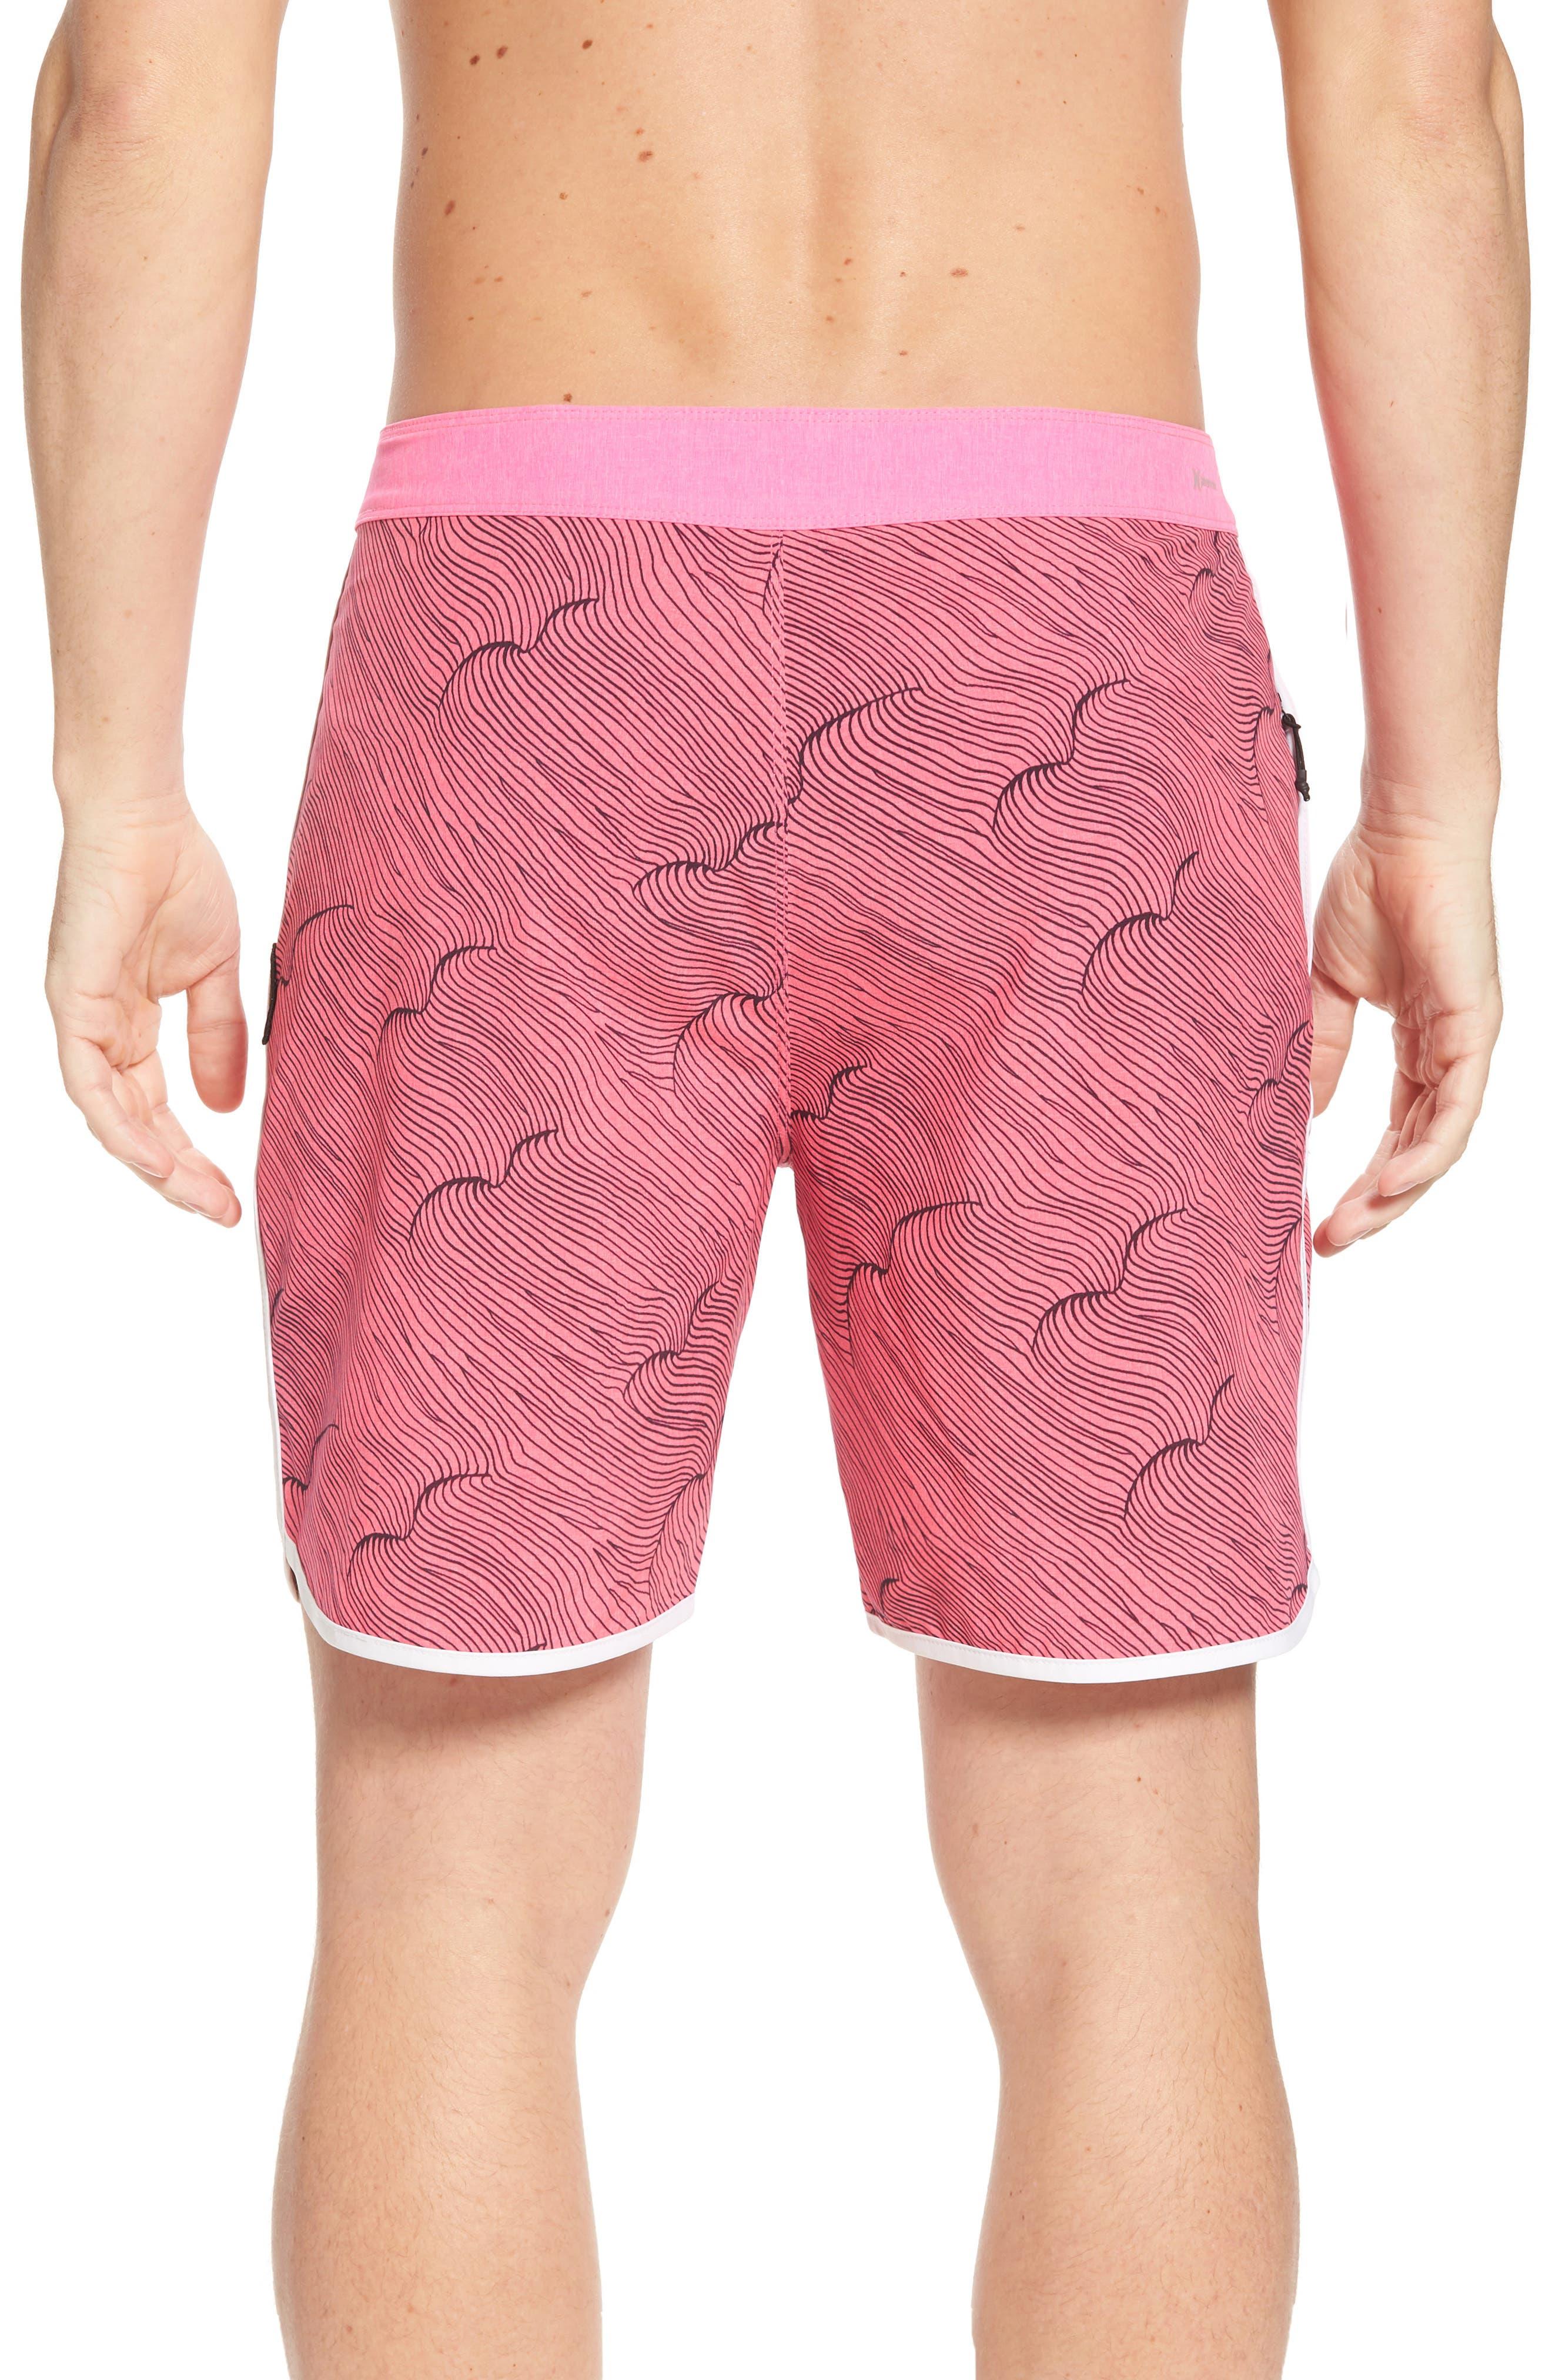 Phantom Thalia Street Board Shorts,                             Alternate thumbnail 2, color,                             Hyper Pink/Black